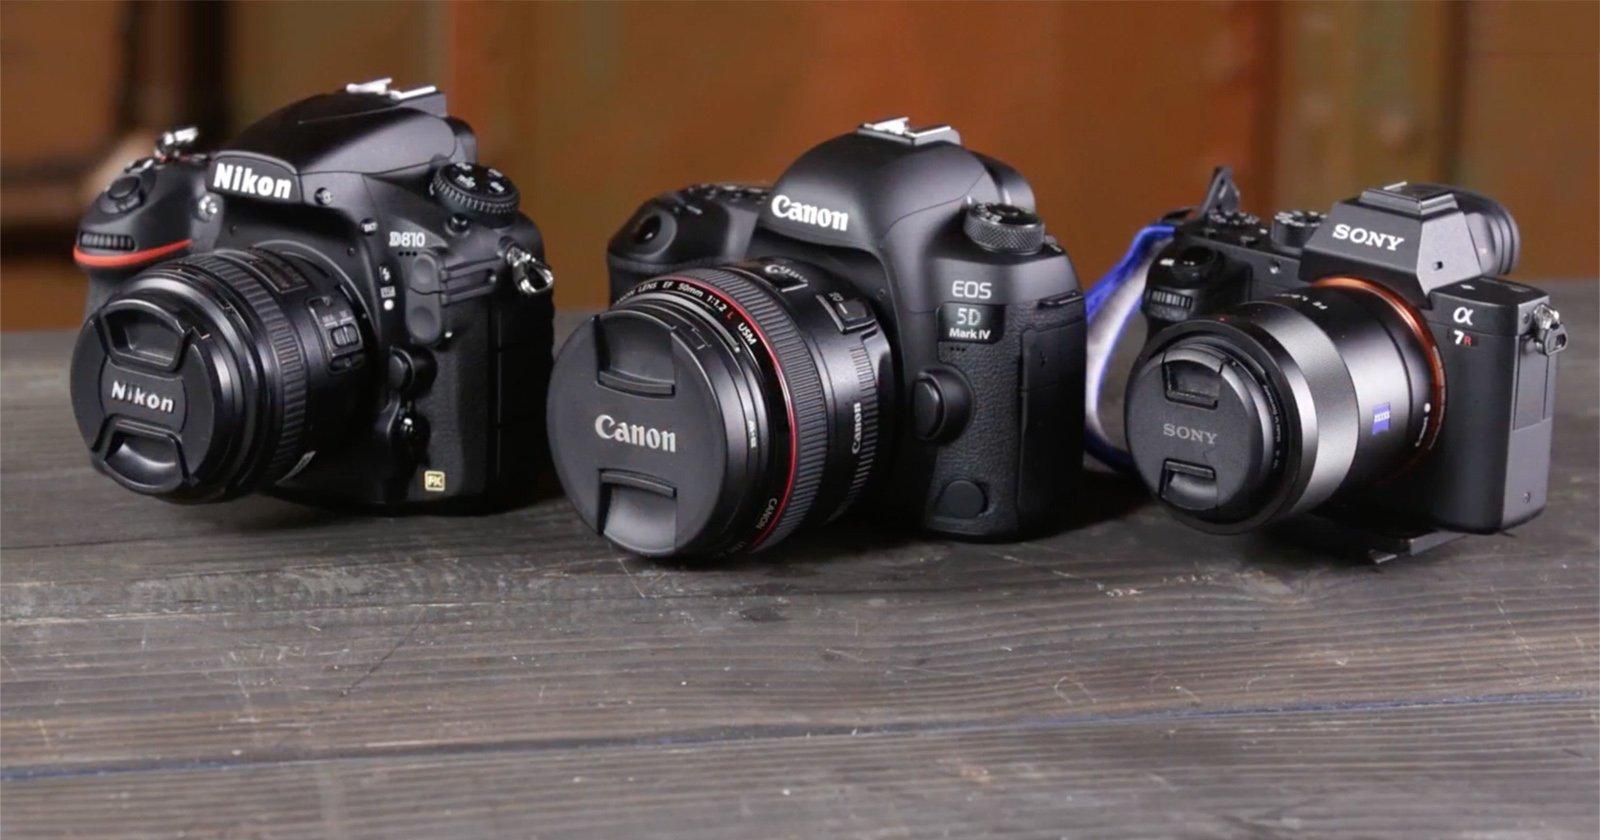 Canon 5D Mark IV Vs Nikon D810 Sony A7R II Side By Comparison